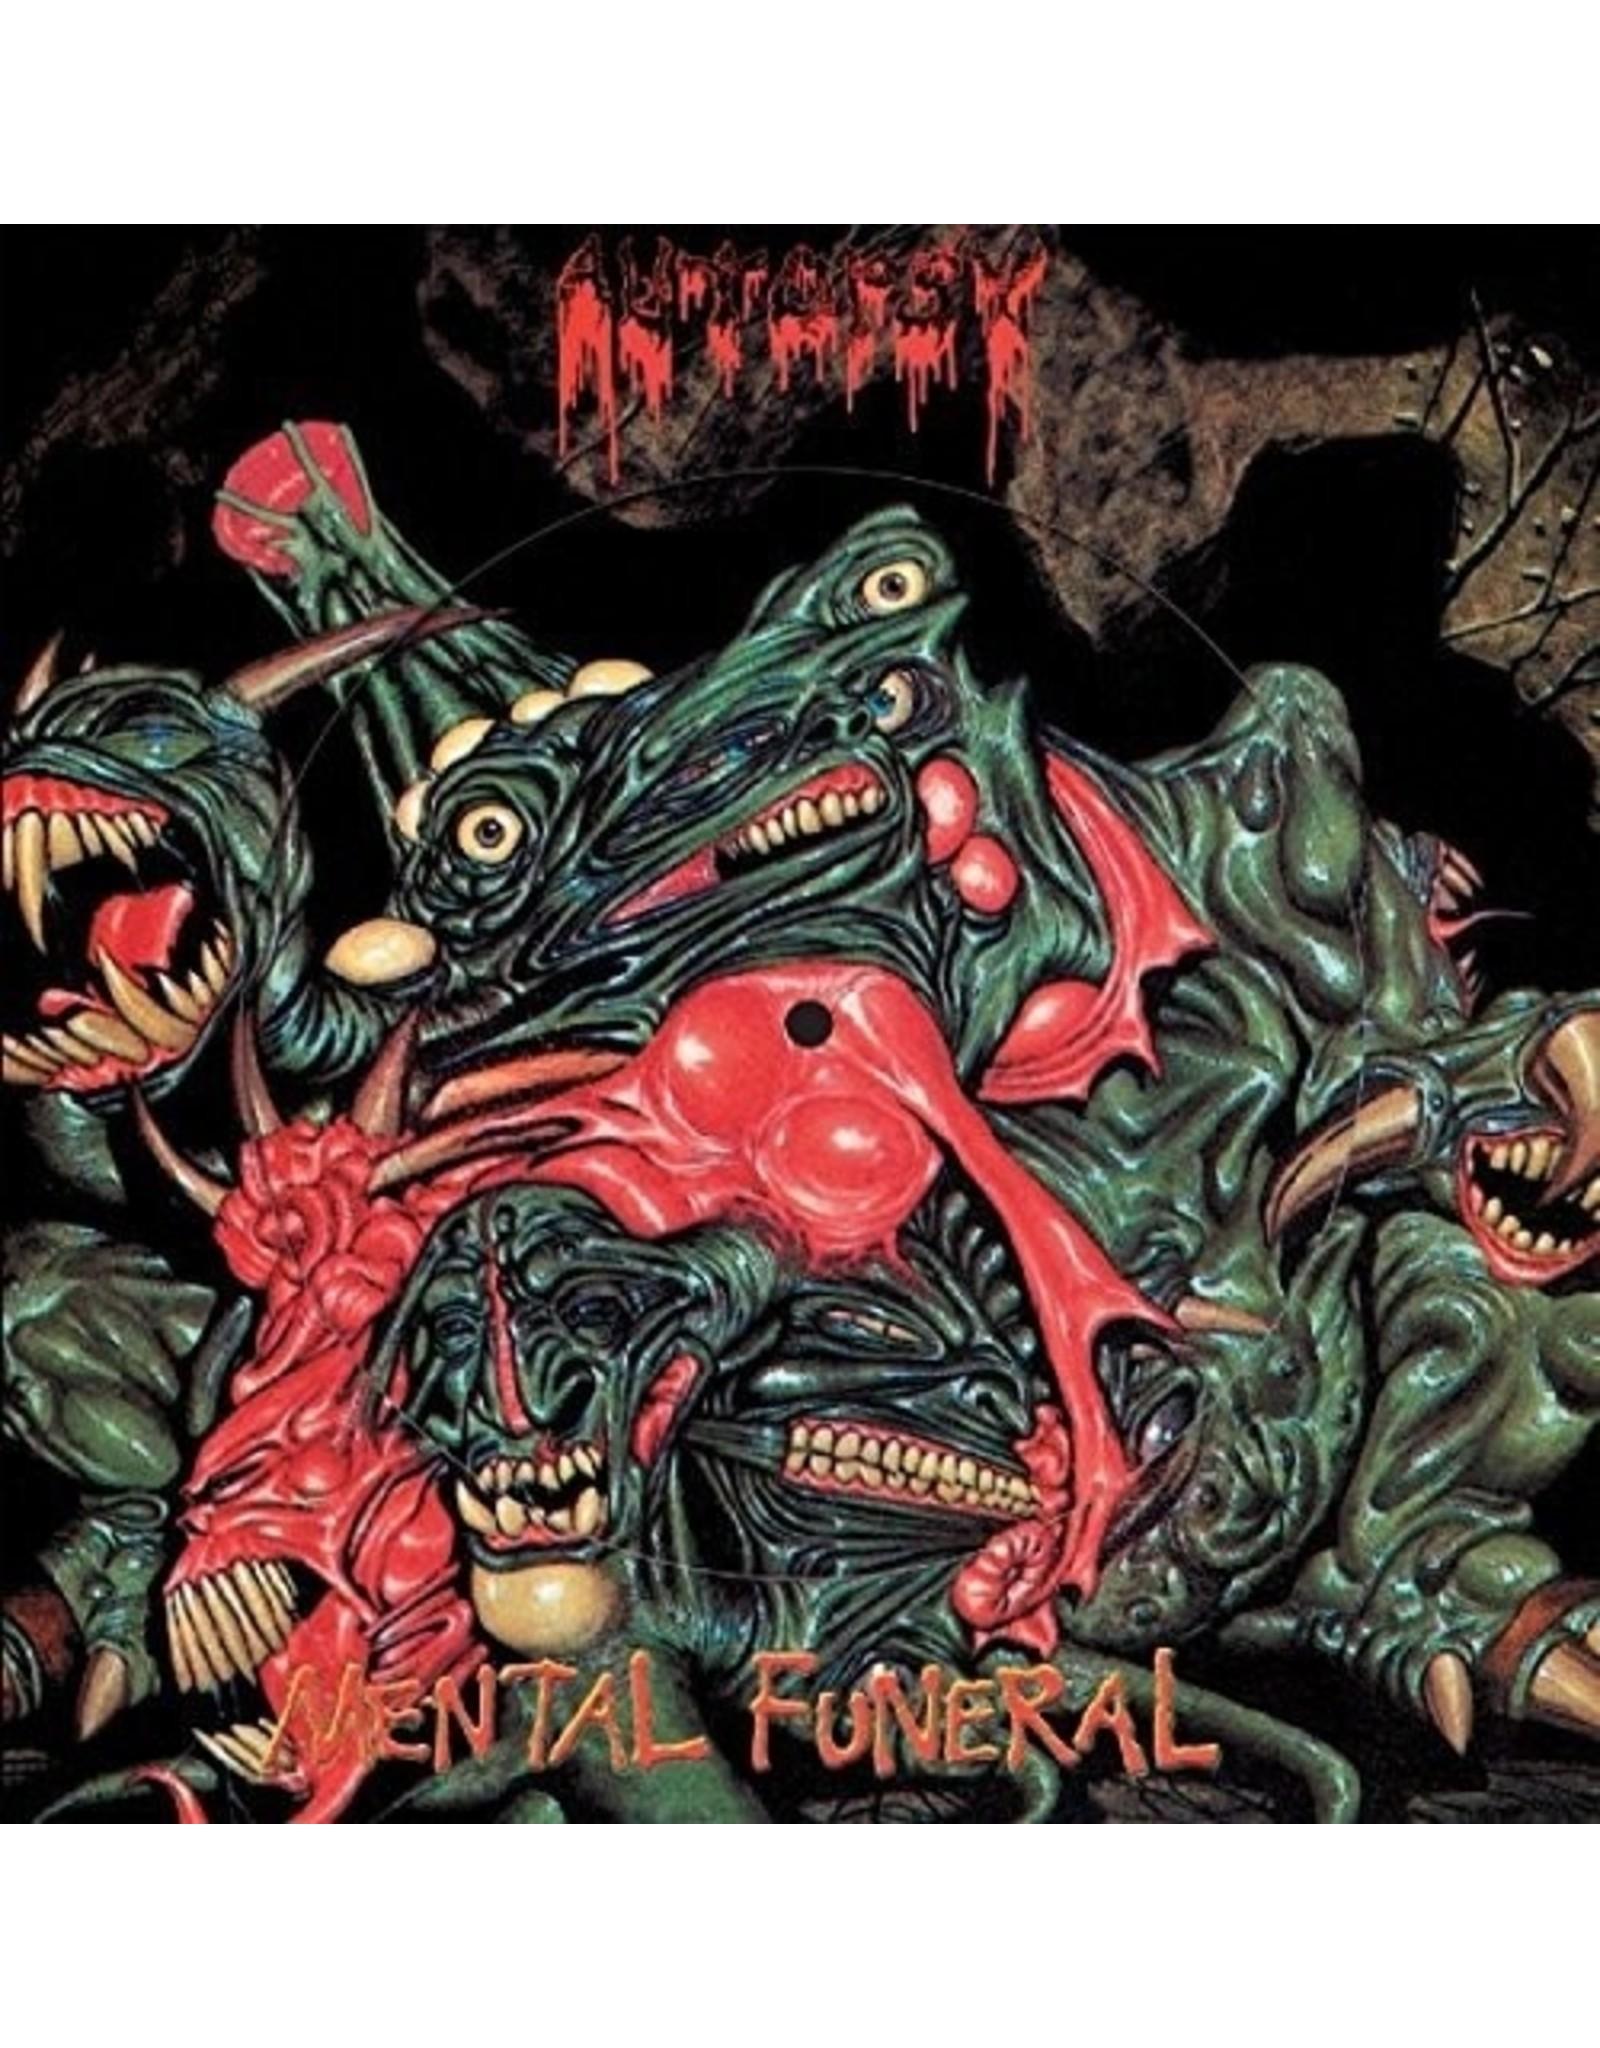 New Vinyl Autopsy - Mental Funeral (Picture) LP